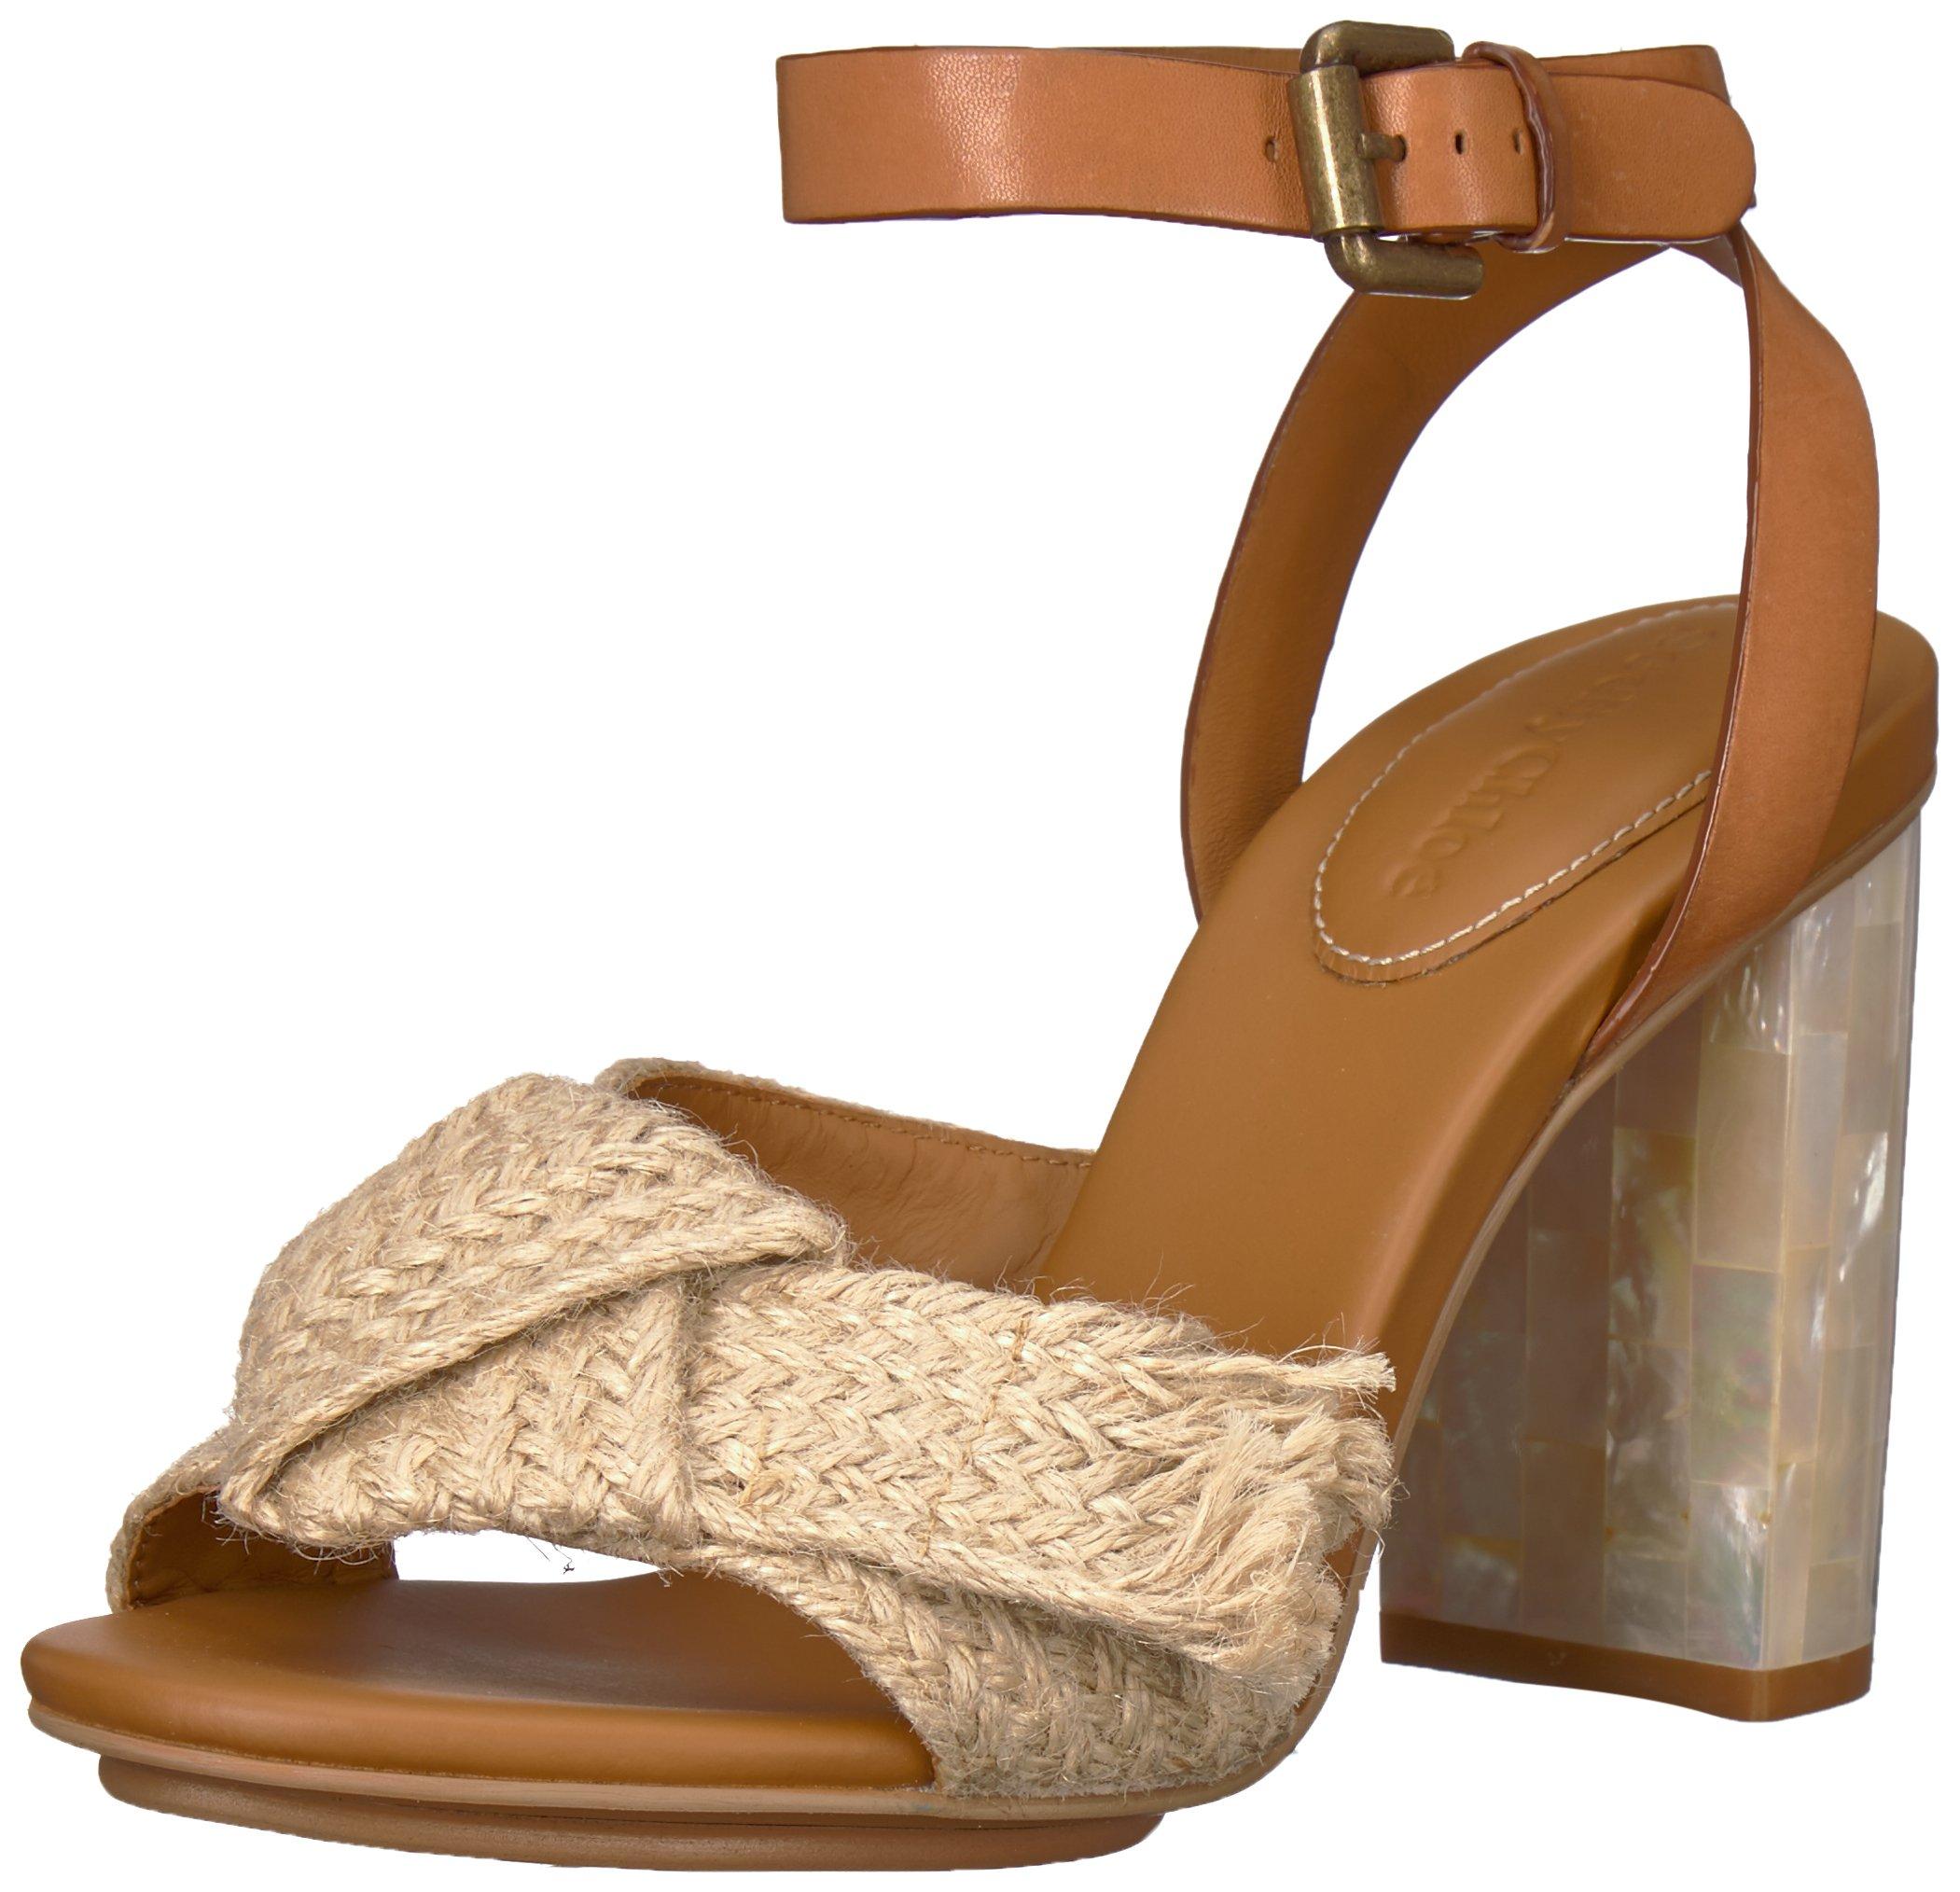 See By Chloe Women's Isida Jute Heeled Sandal, Natural, 39.5 M EU (9.5 US)